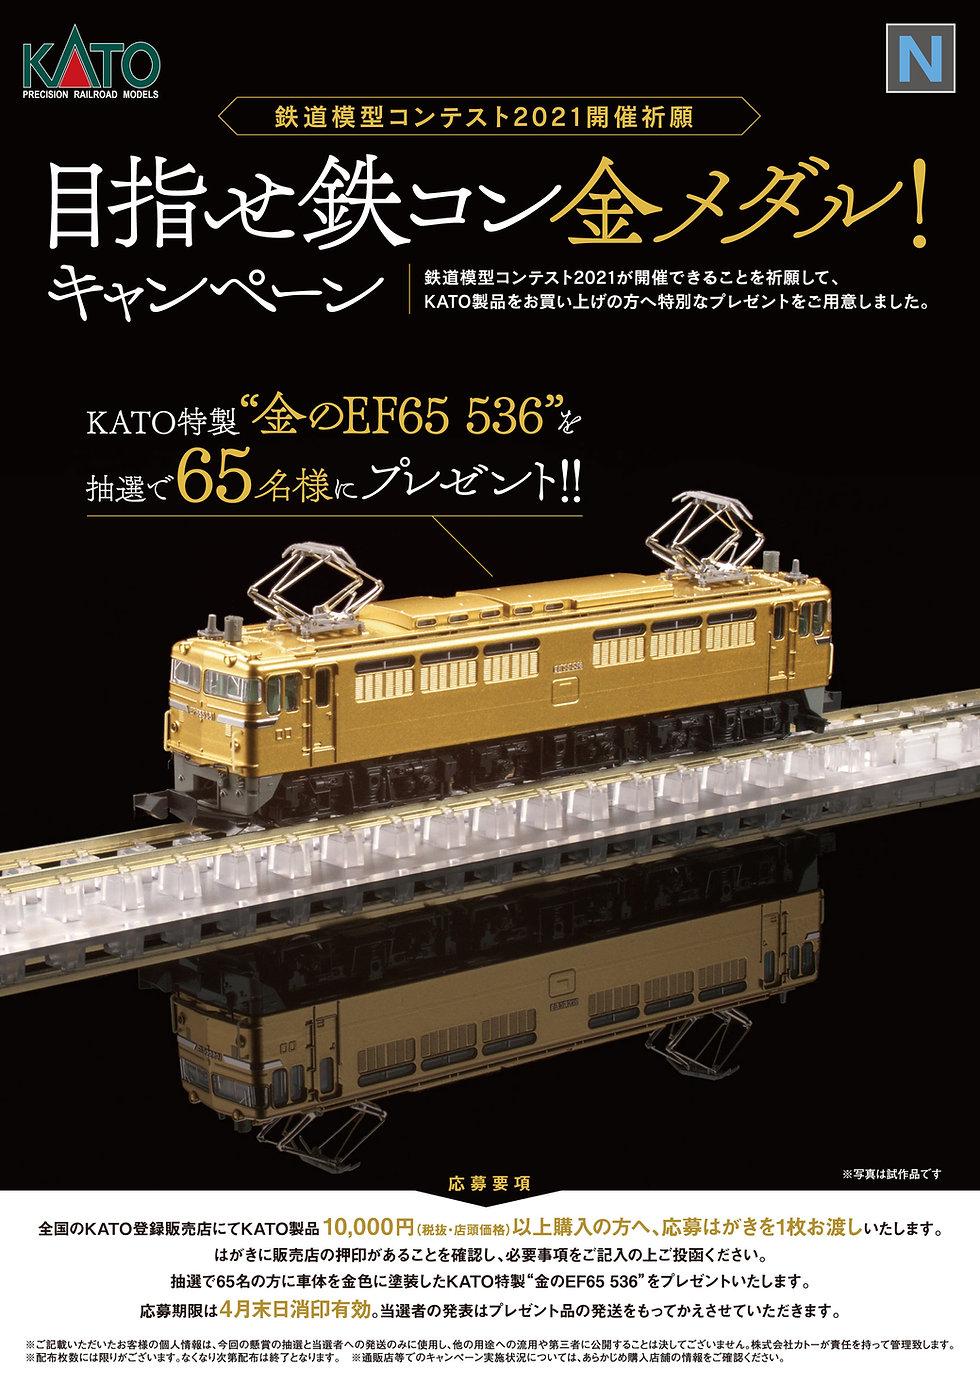 kato_goldEF65.jpg